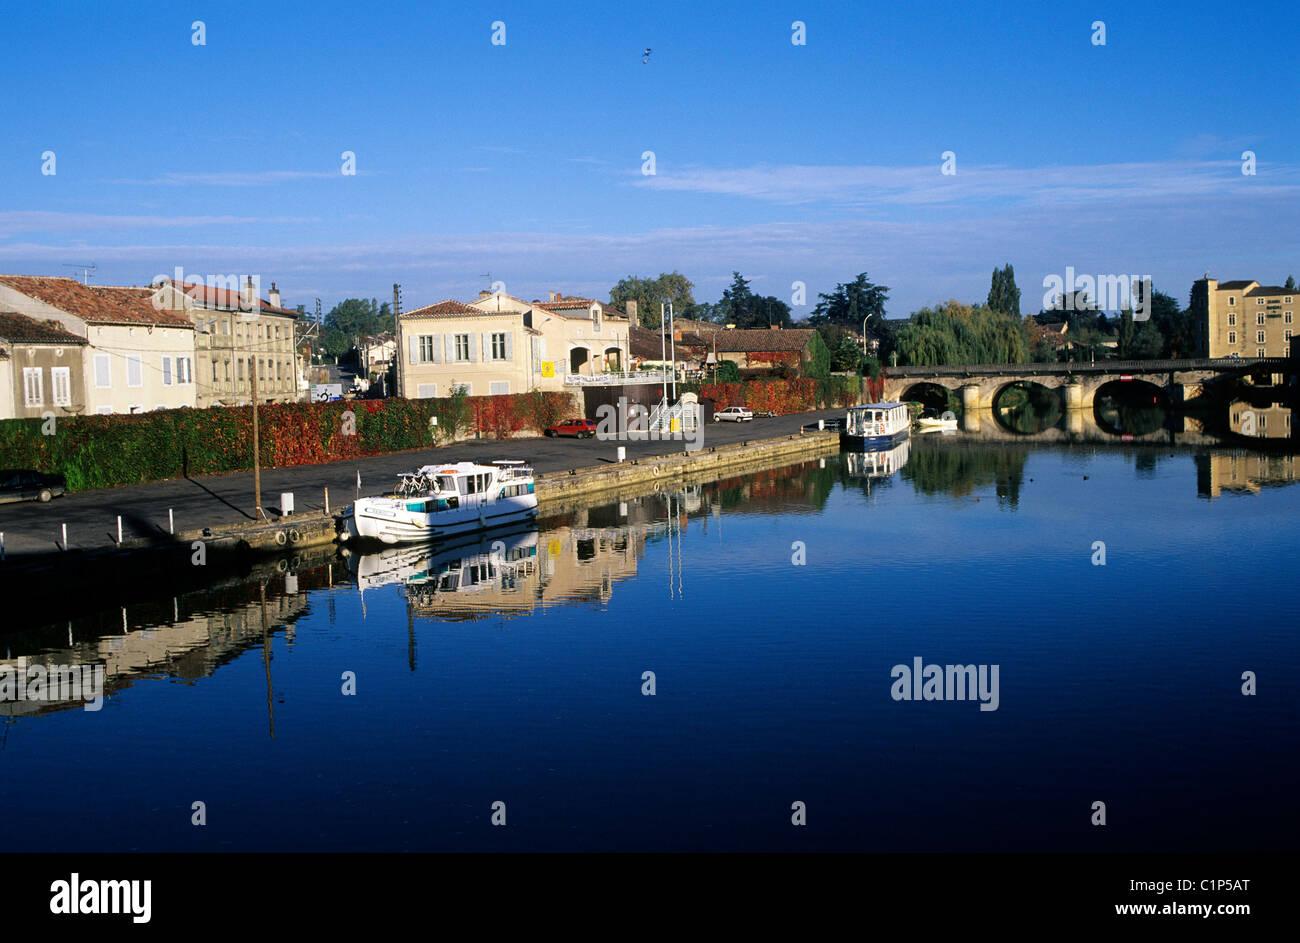 France Midi Stock Photos & France Midi Stock Images - Alamy